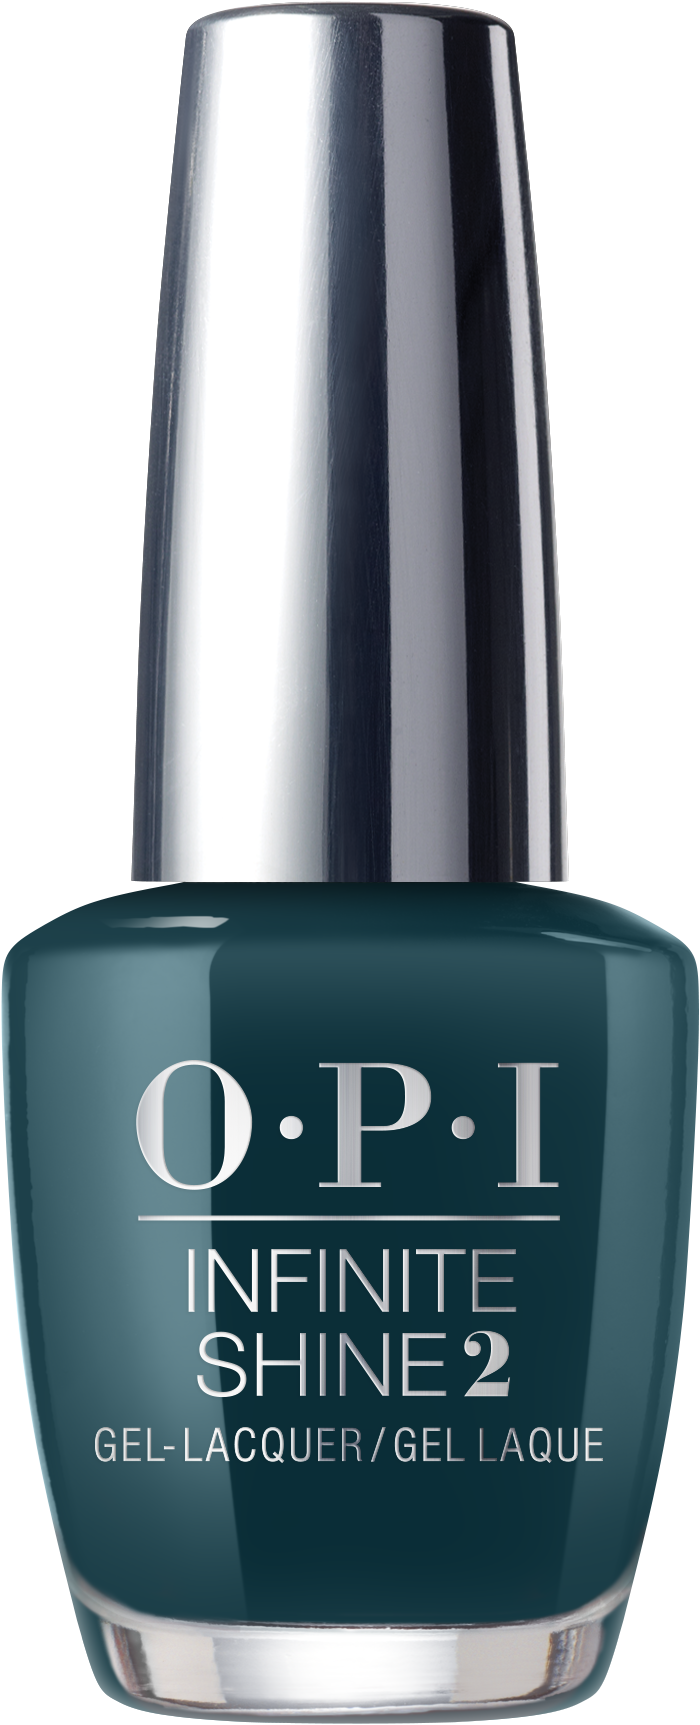 OPI Лак для ногтей / CIA=Color is Awesome Infinite Shine 15 мл opi infinite shine base coat базовое покрытие для ногтей 15 мл